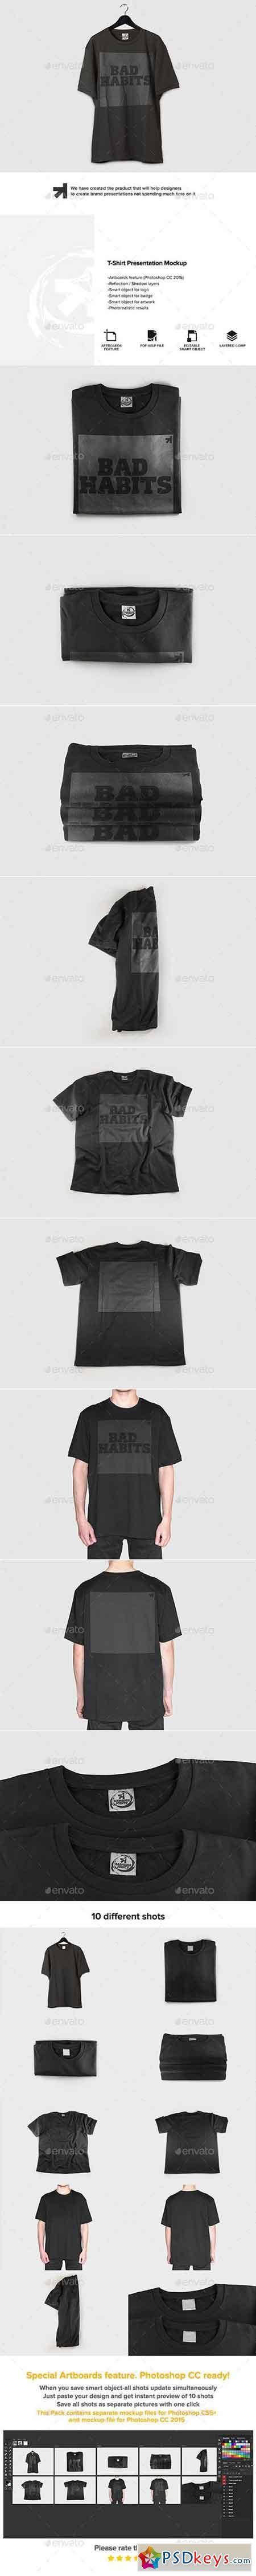 Black T-Shirt Presentation Mockup 16726206